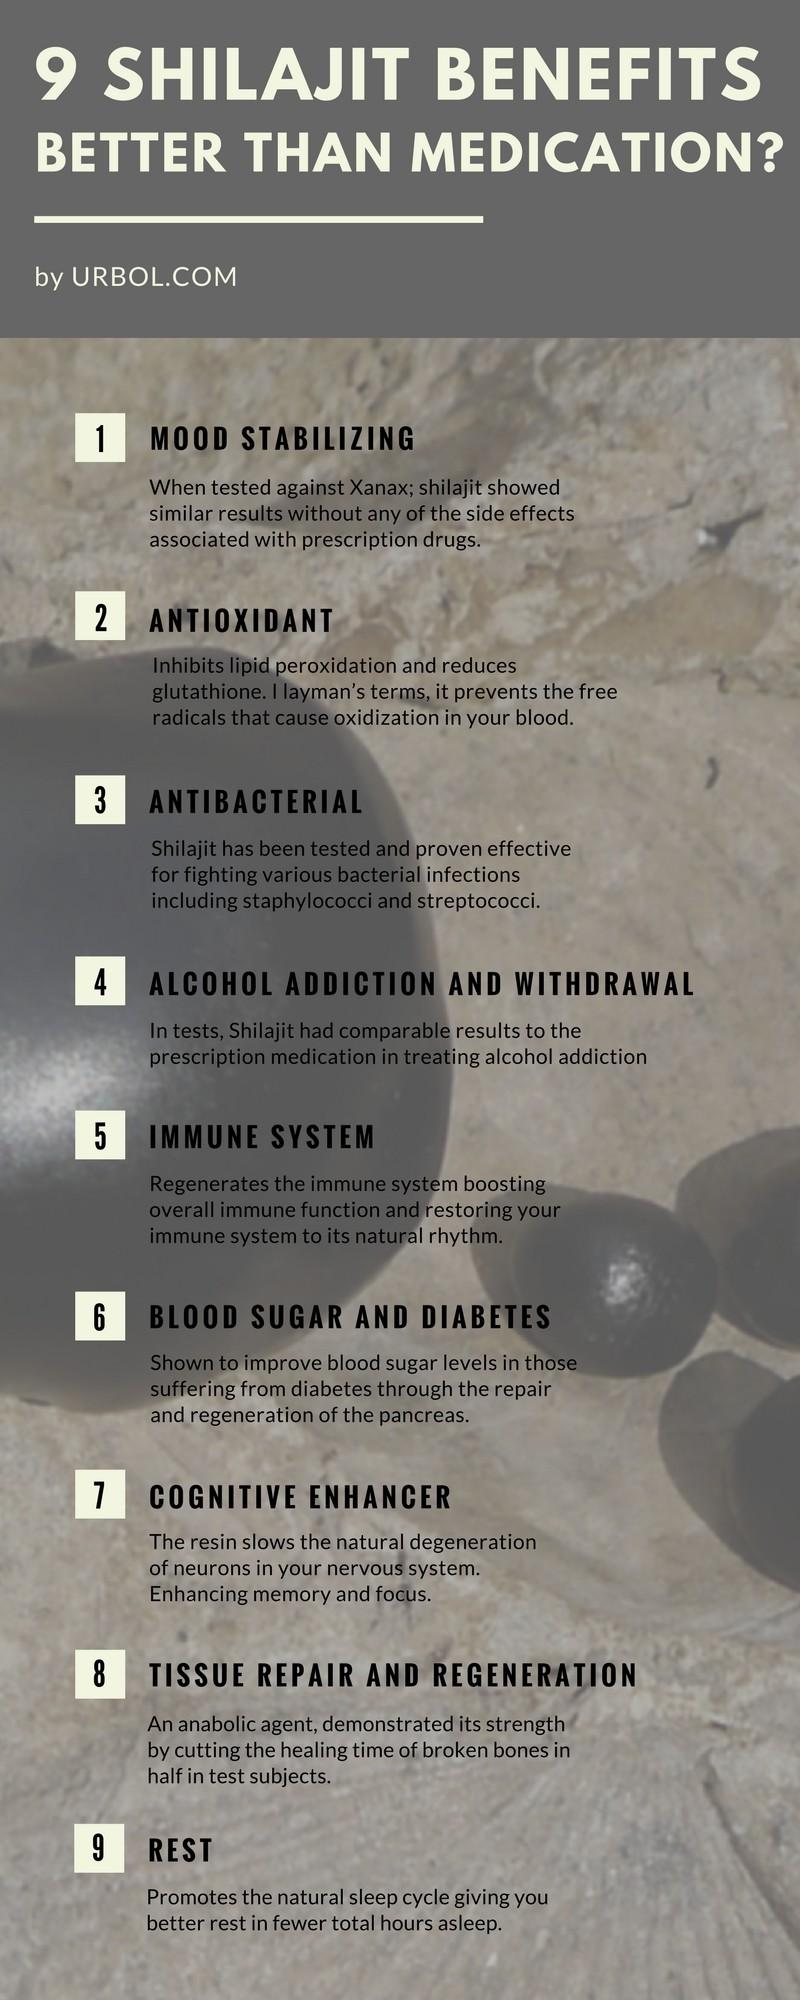 Shilajit Benefits Infographic